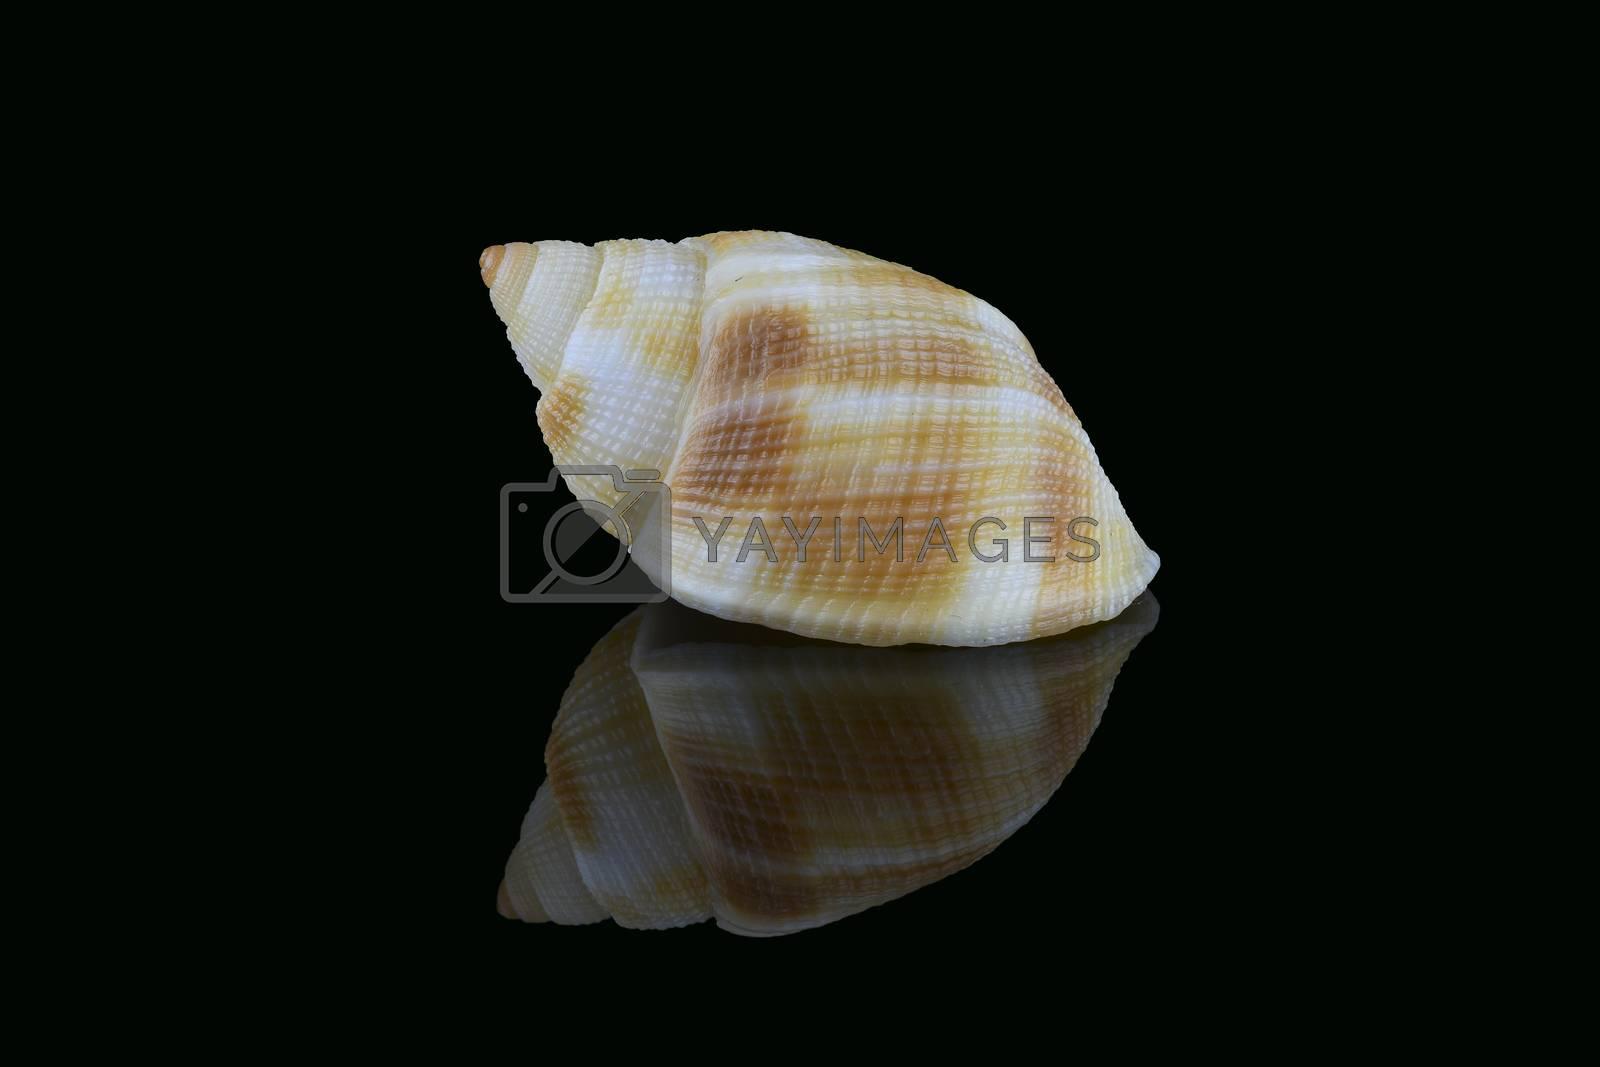 Nassarius seashell, common name nassa mud snails (USA) or dog whelks (UK). Marine gastropod molluscs, Nassariidae family. L3,5xW2xH1,8cm. Found in Dubai beach, UAE